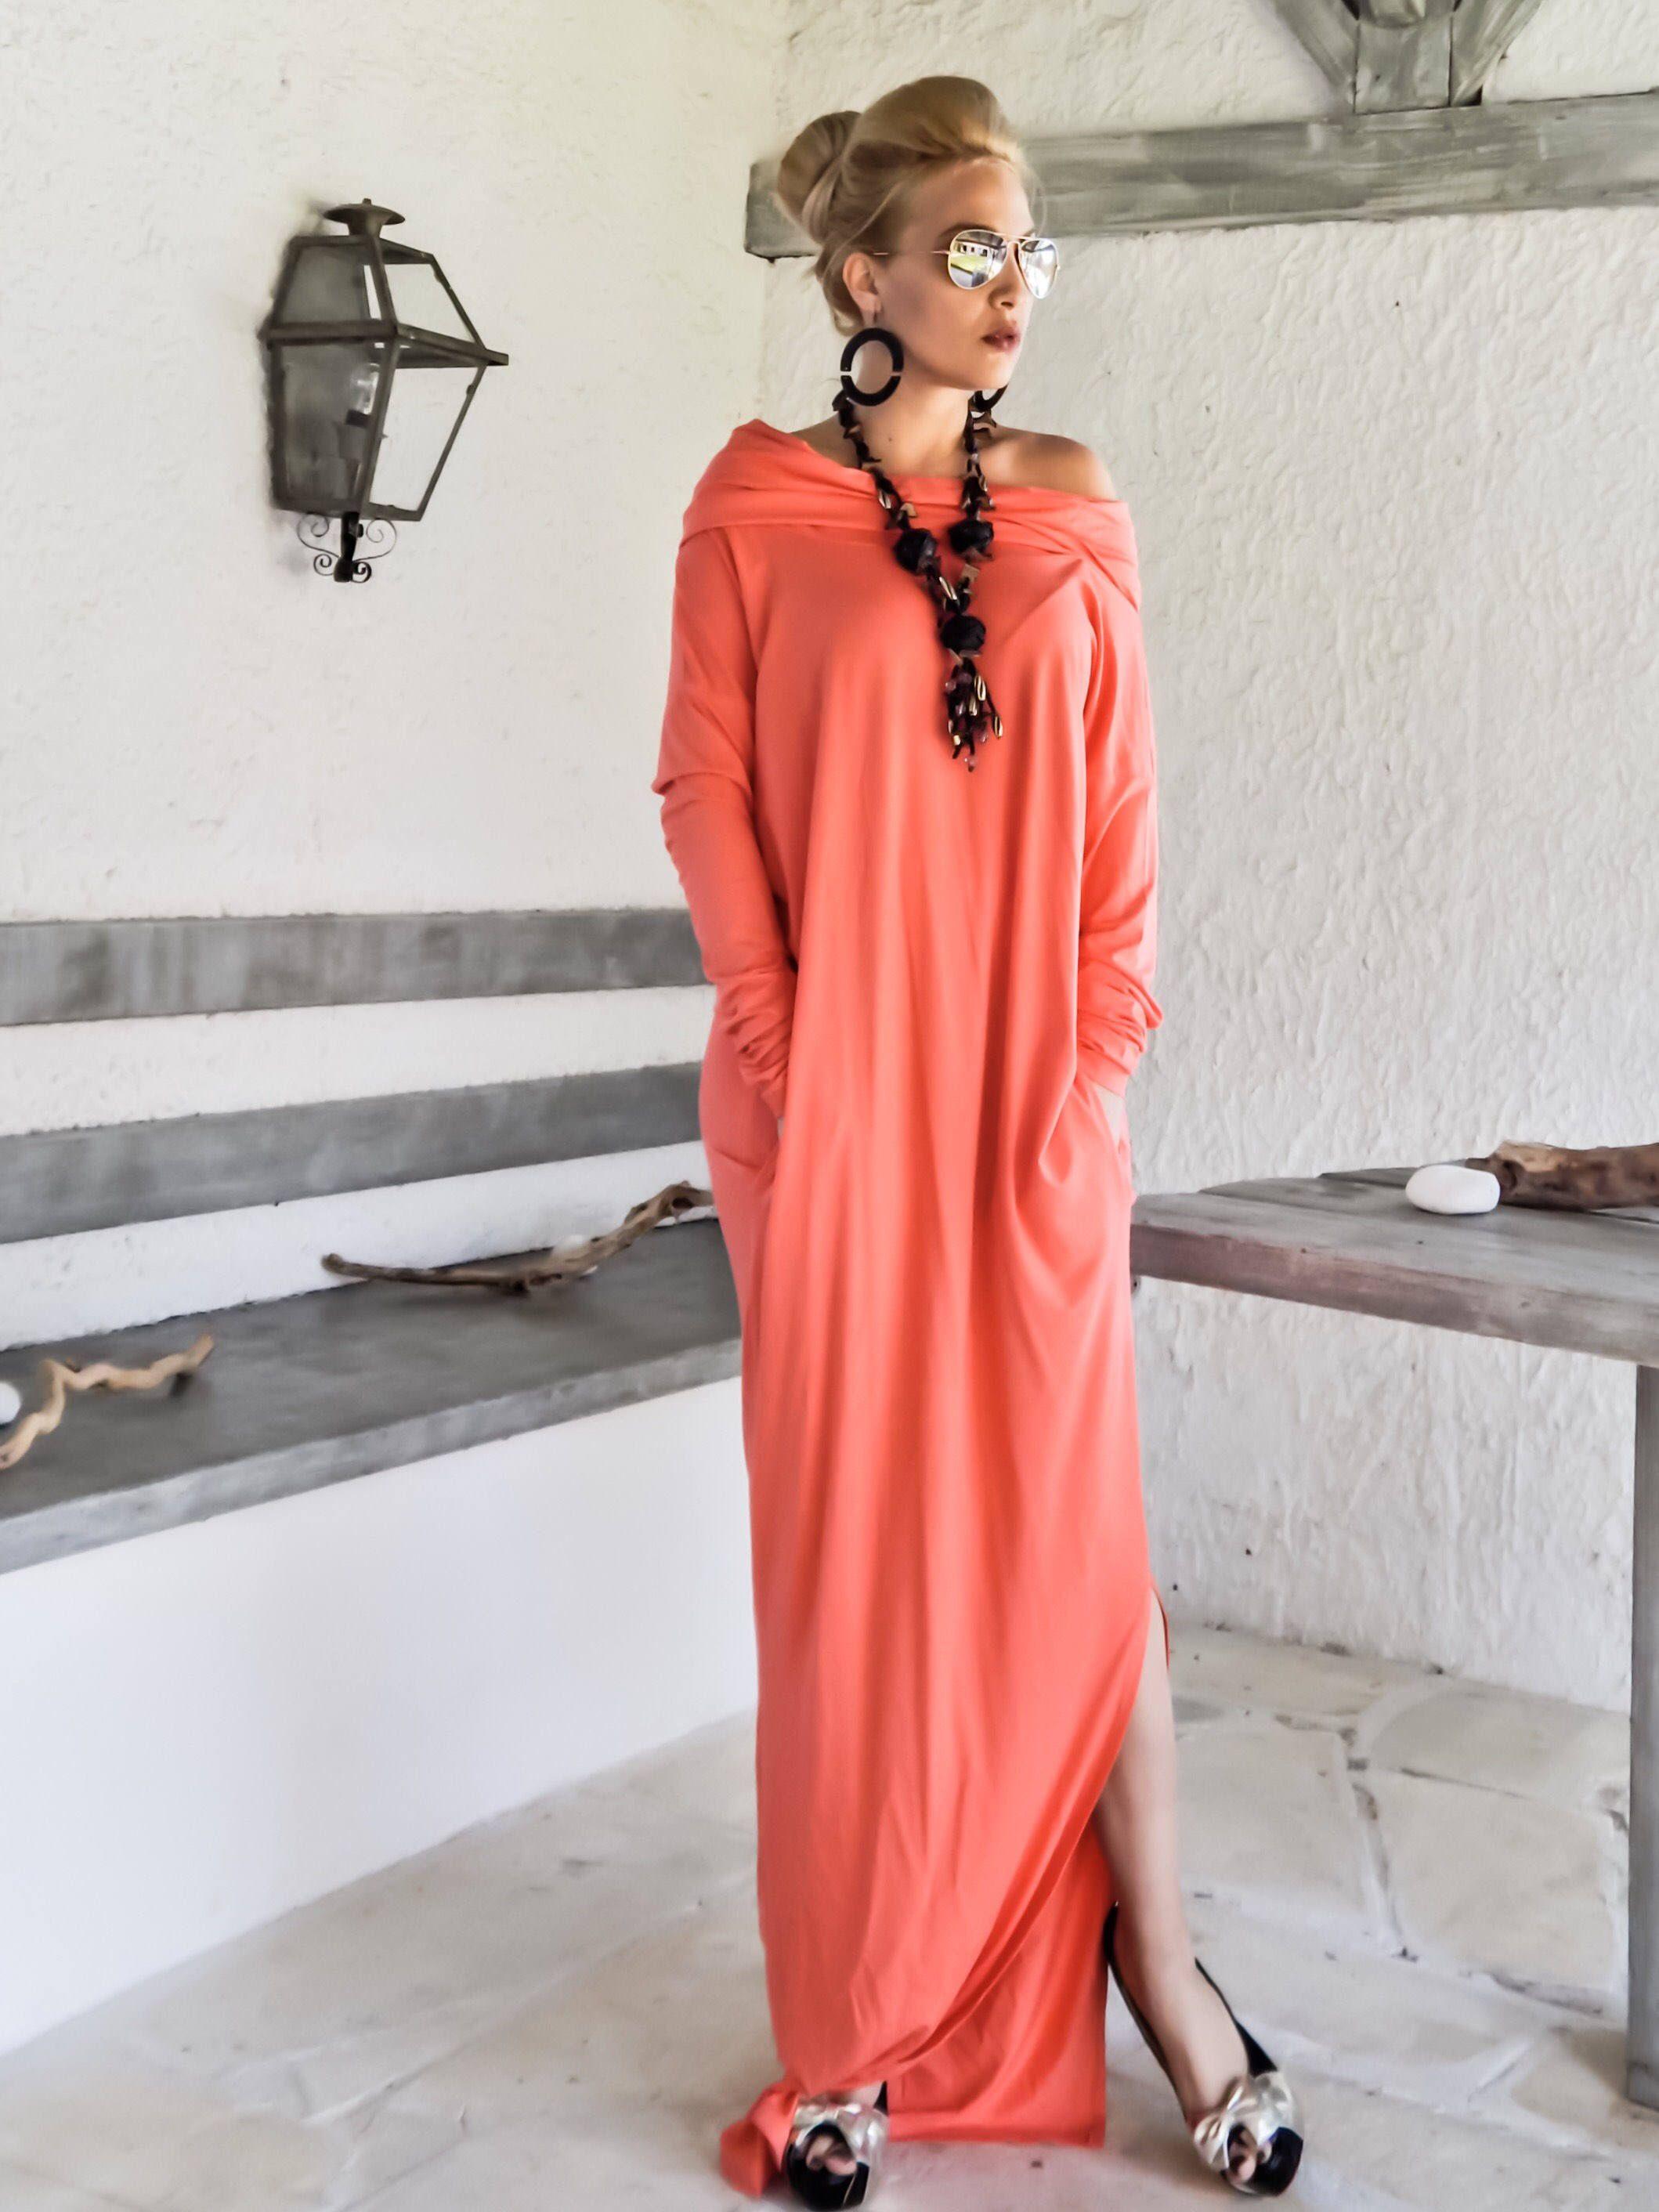 New Coral Maxi Dress Coral Dress Kaftan Long Sleeve Dress Turtleneck Plus Size Long Sleeve Turtleneck Dress Coral Maxi Dresses Long Sleeve Maxi Dress [ 2824 x 2118 Pixel ]